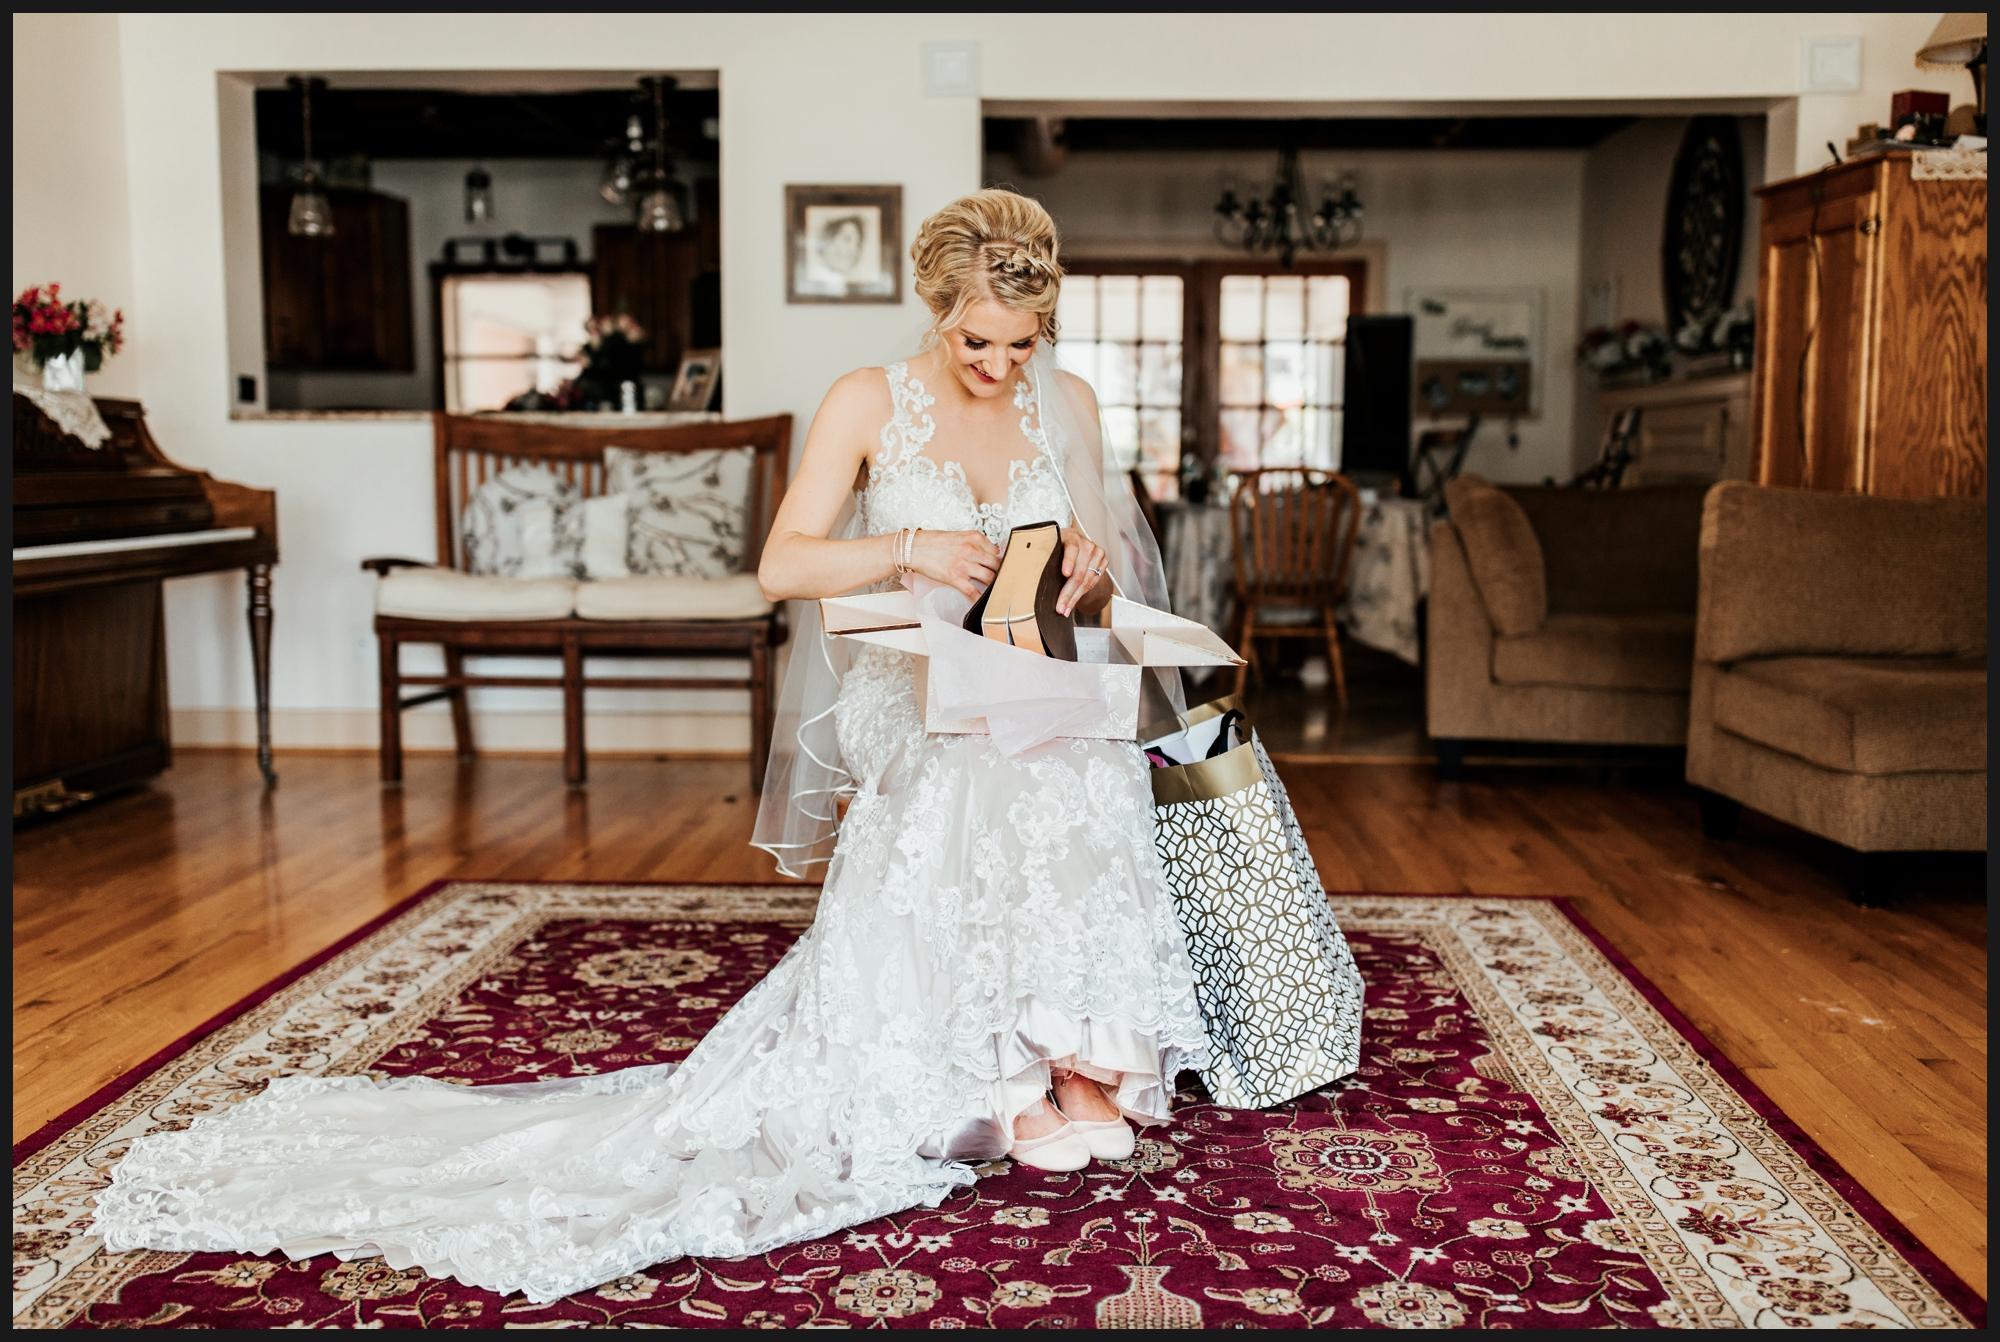 Orlando-Wedding-Photographer-destination-wedding-photographer-florida-wedding-photographer-hawaii-wedding-photographer_0570.jpg